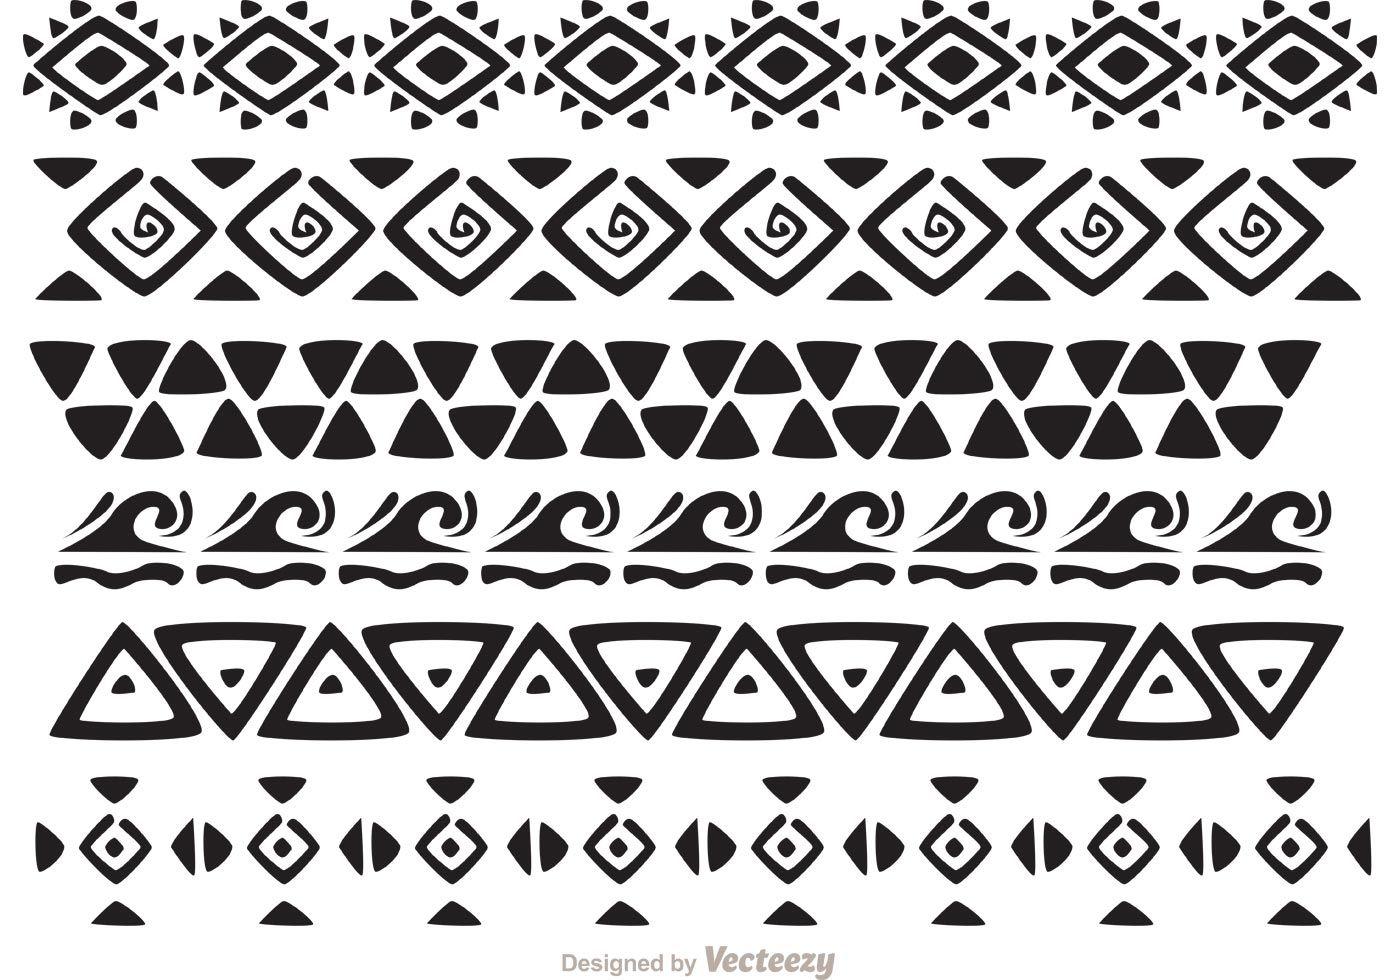 Hawaiian petroglyph symbols and meanings gallery symbol and sign hawaiian tribal pattern vectors pack 2 another awesome hawaiian hawaiian tribal pattern vectors pack 2 another biocorpaavc